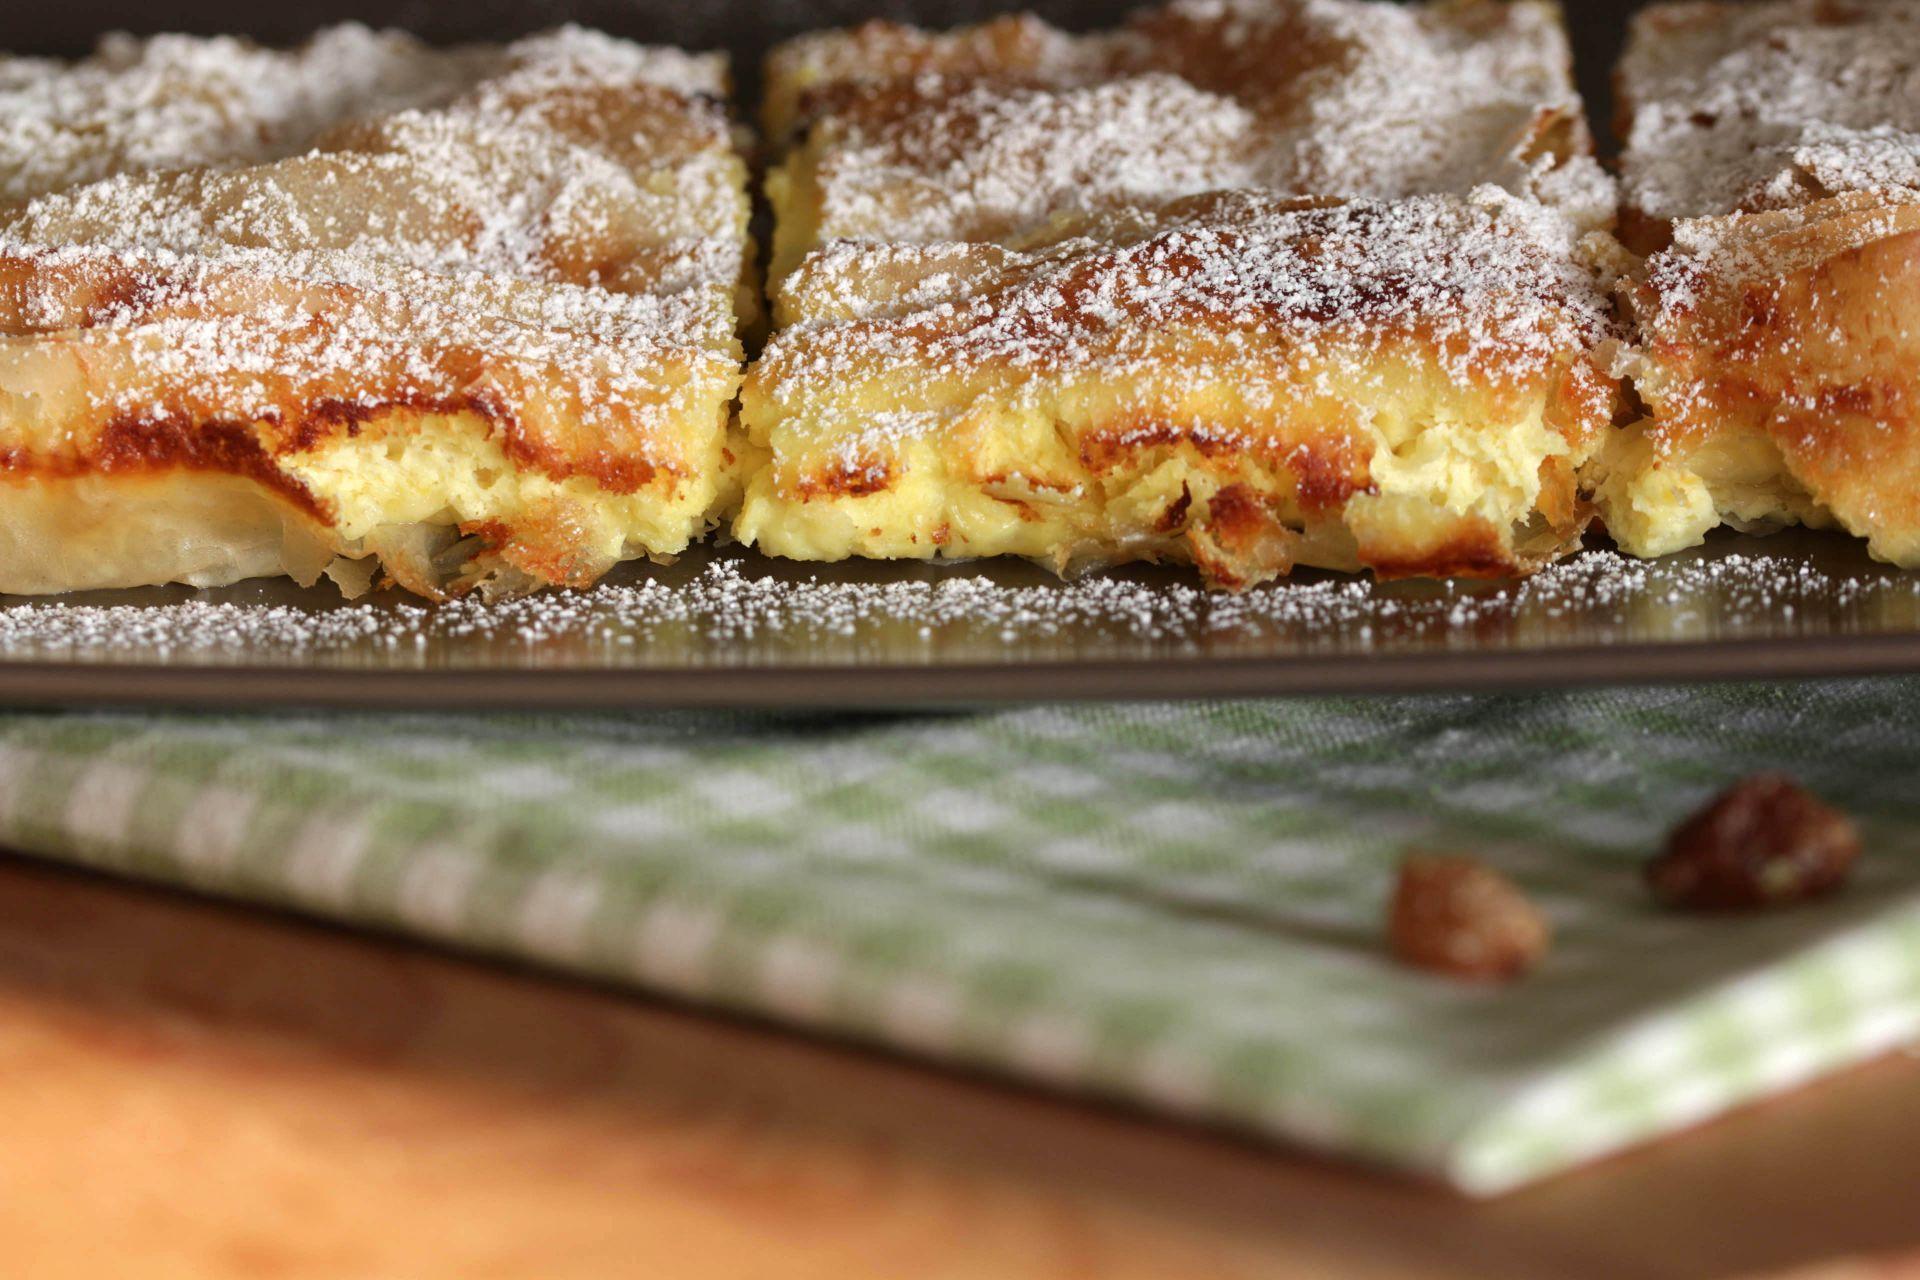 Places to enjoy a dessert in Antiparos